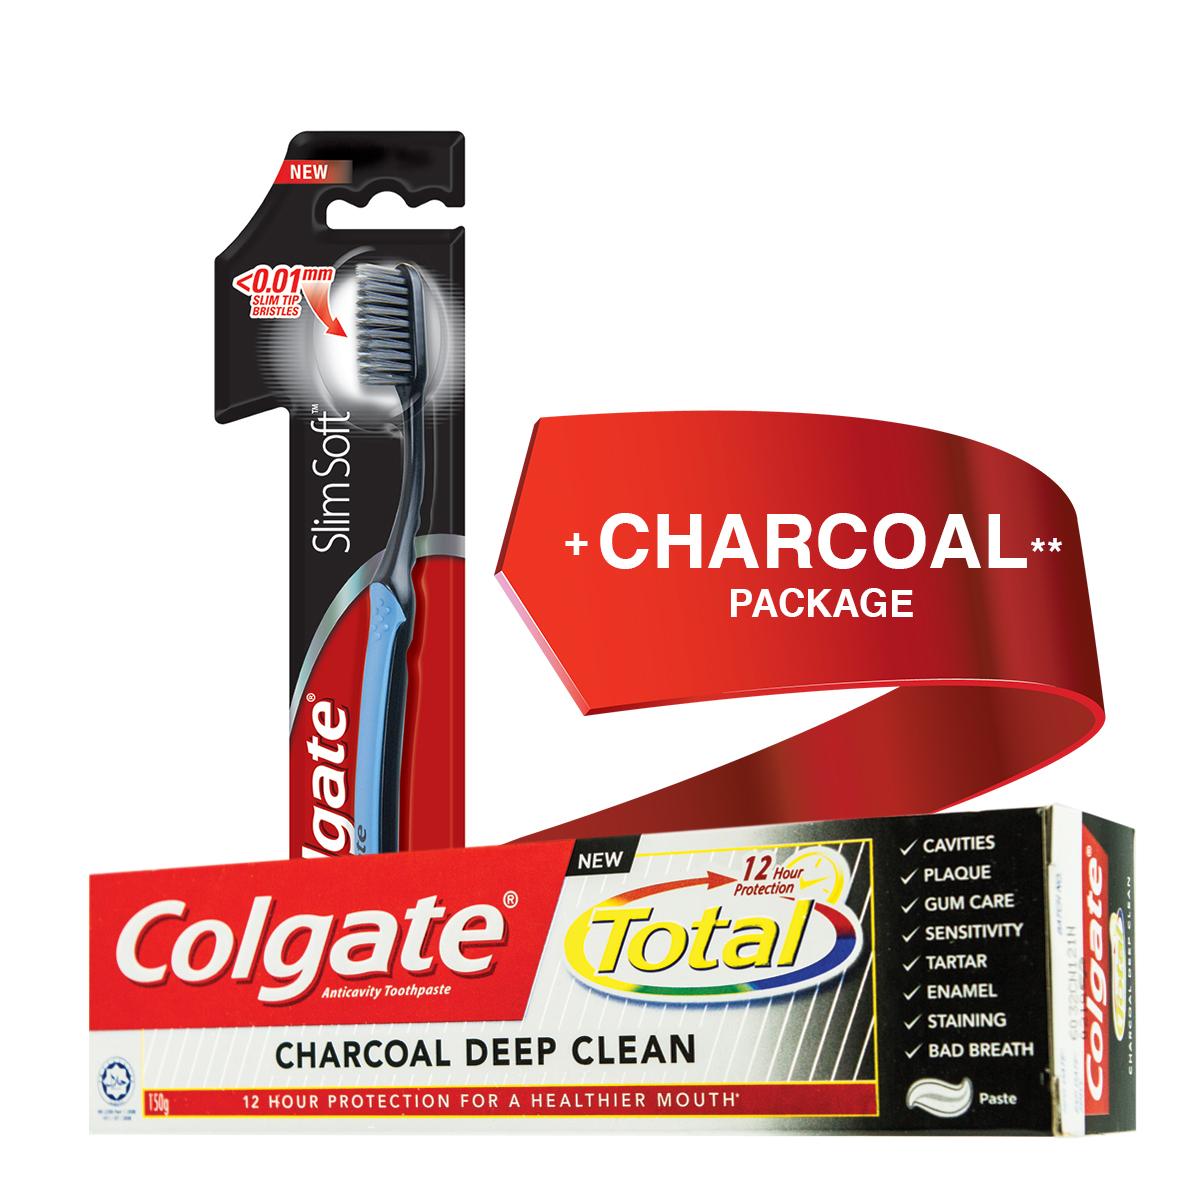 Body Care Blanjacom Gillette Blue Simpe 3 4s Paket Isi 2 Colgate Tb Slimsoft Charcoal 1s Total Paste 150gr